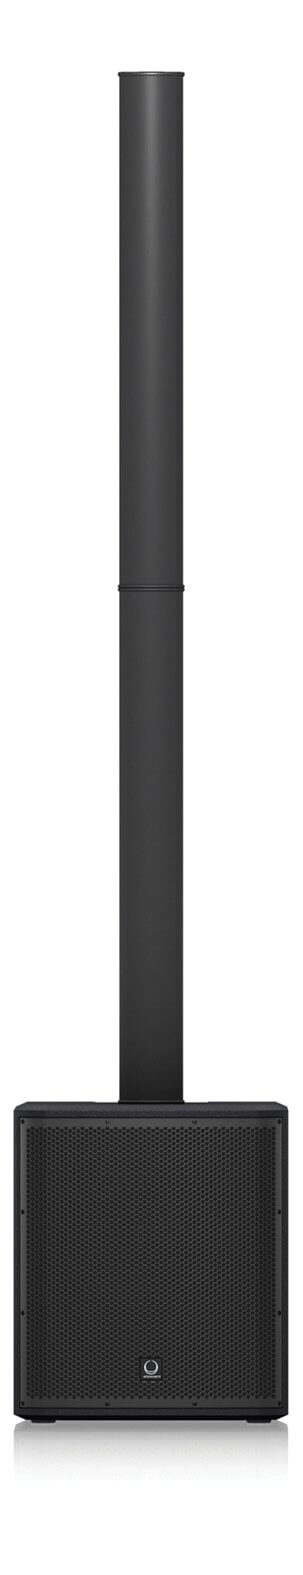 Turbosound iNSPIRE iP2000 1,000 Watt Powered Column Loudspeaker